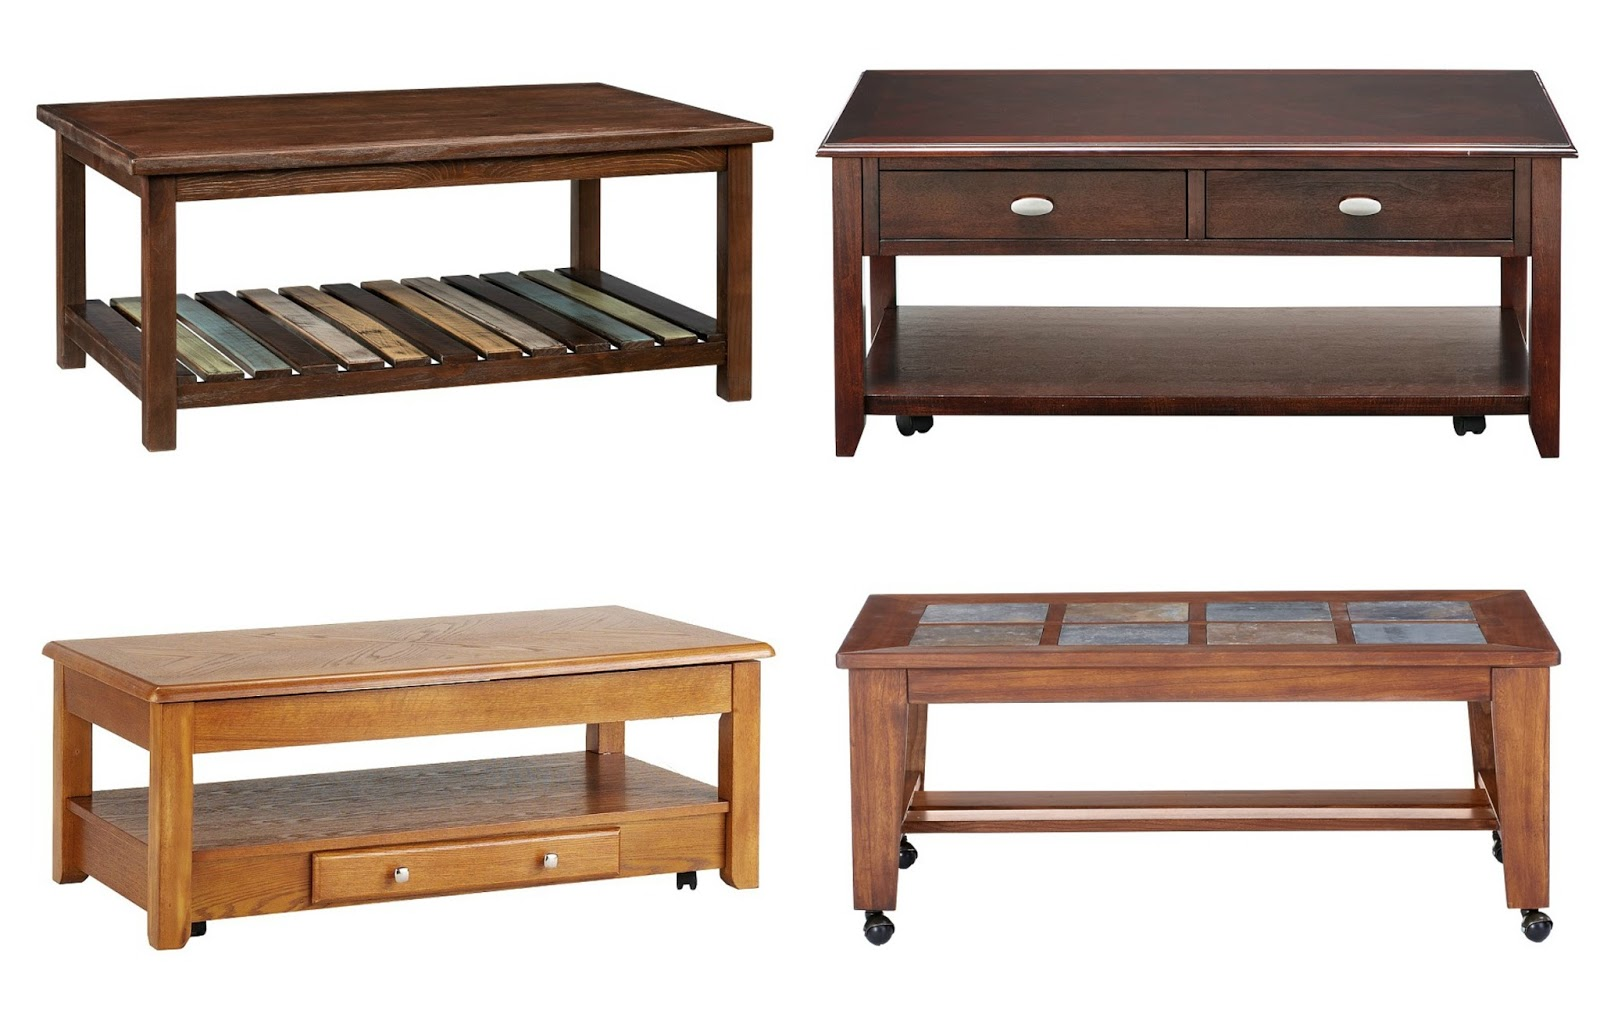 Fabulous Slumberland Furniture Store Osage Beach Mo Table Talk Pdpeps Interior Chair Design Pdpepsorg